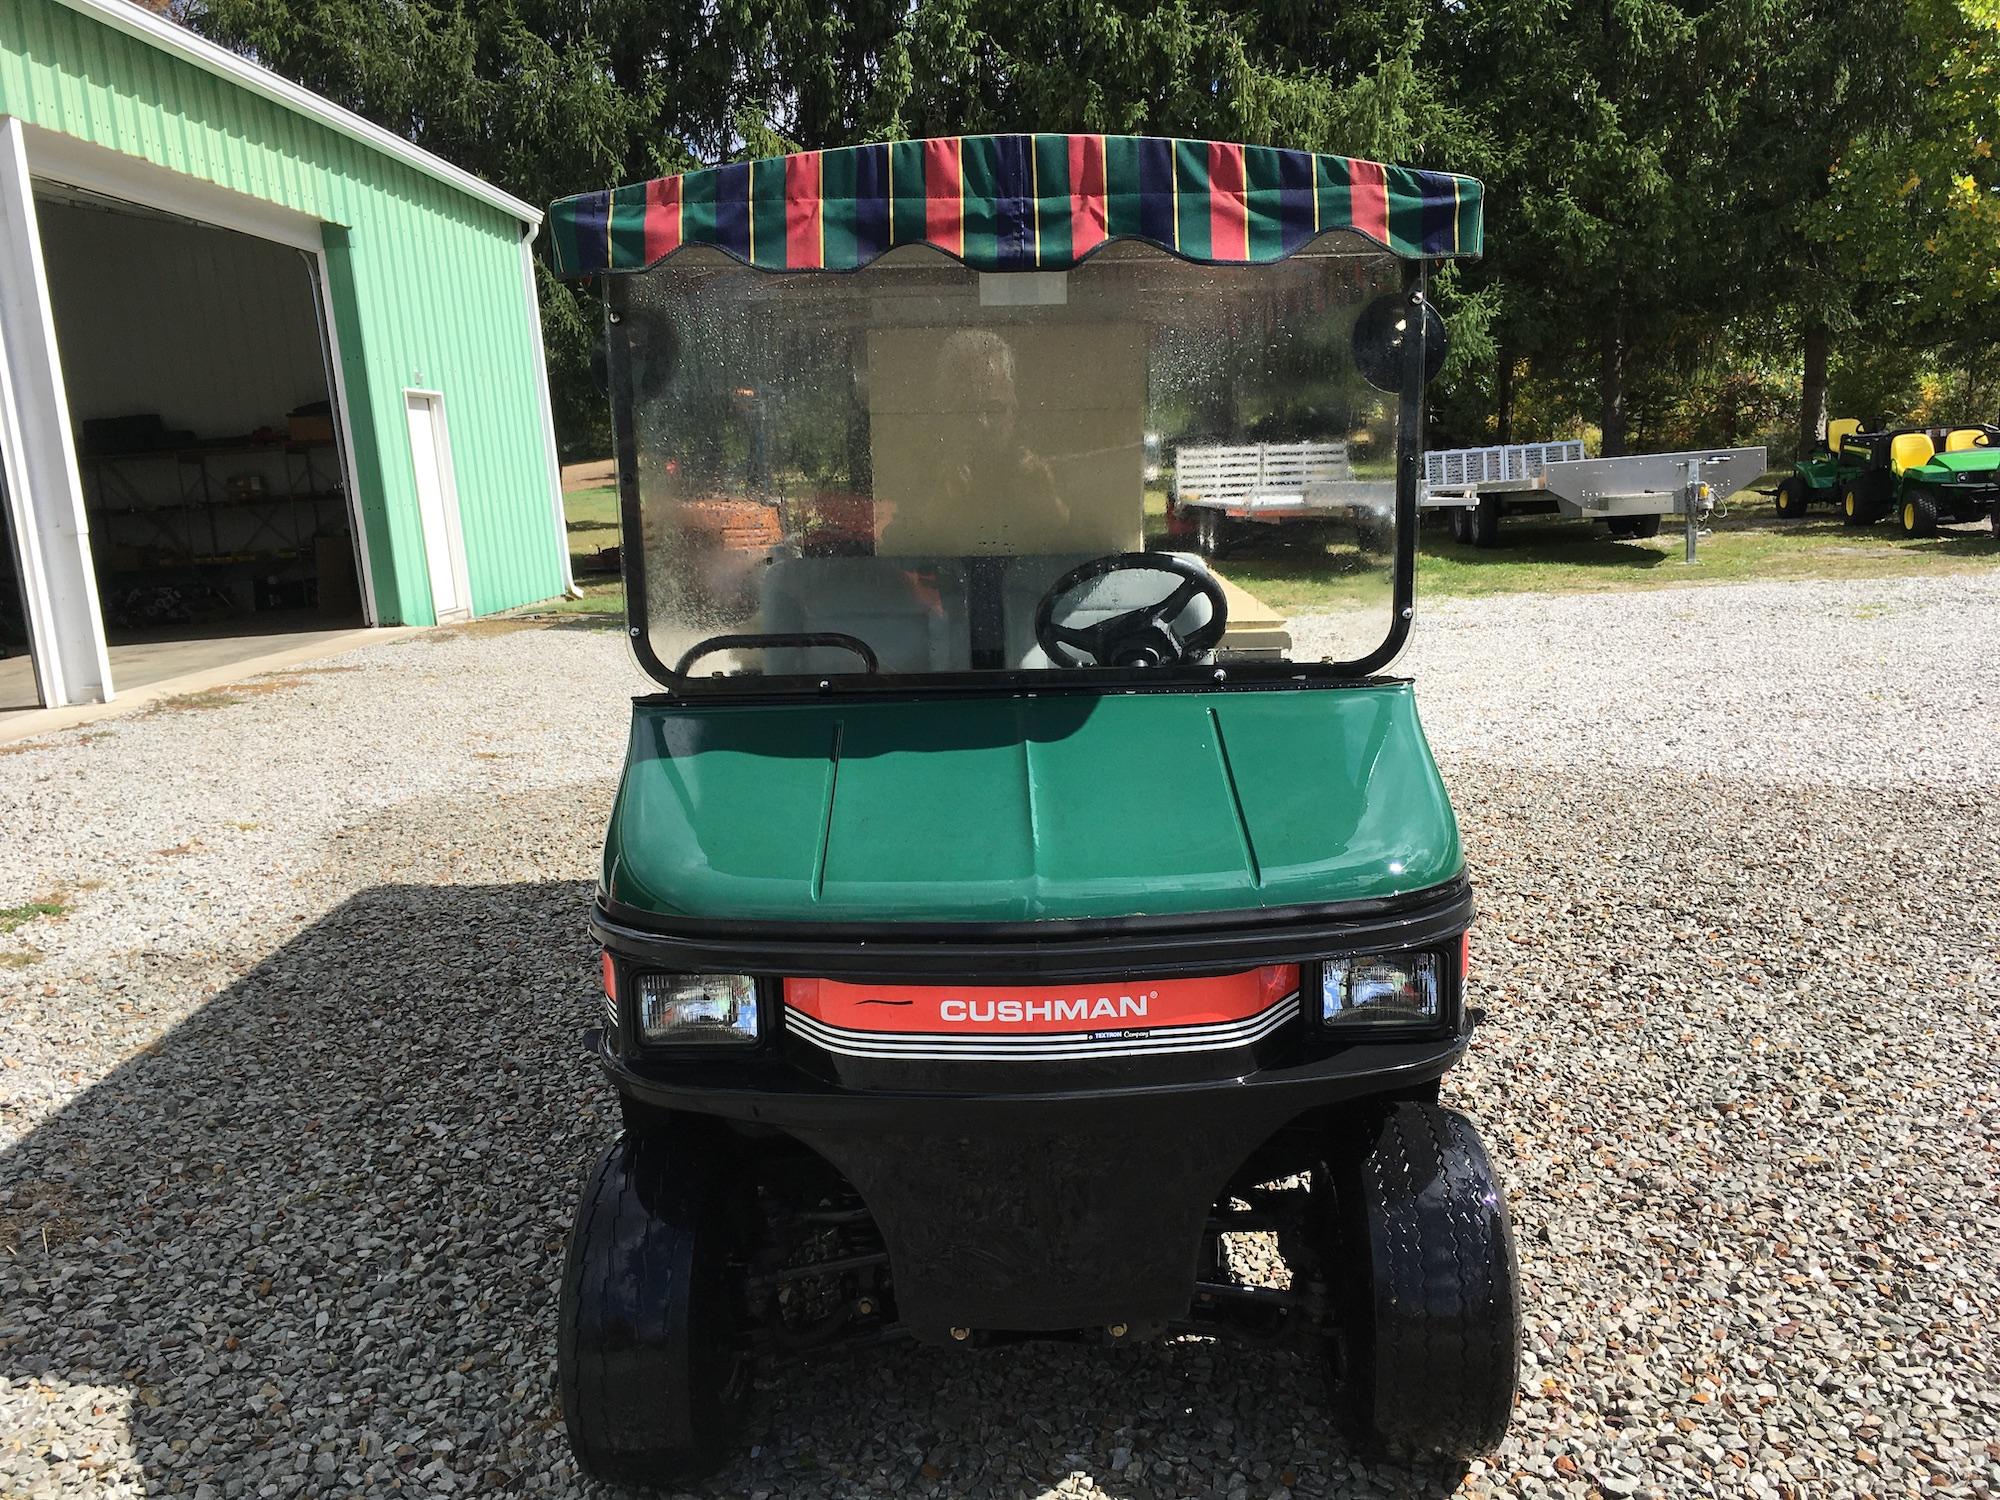 Cushman-Haulster-Beverage-Cart-02